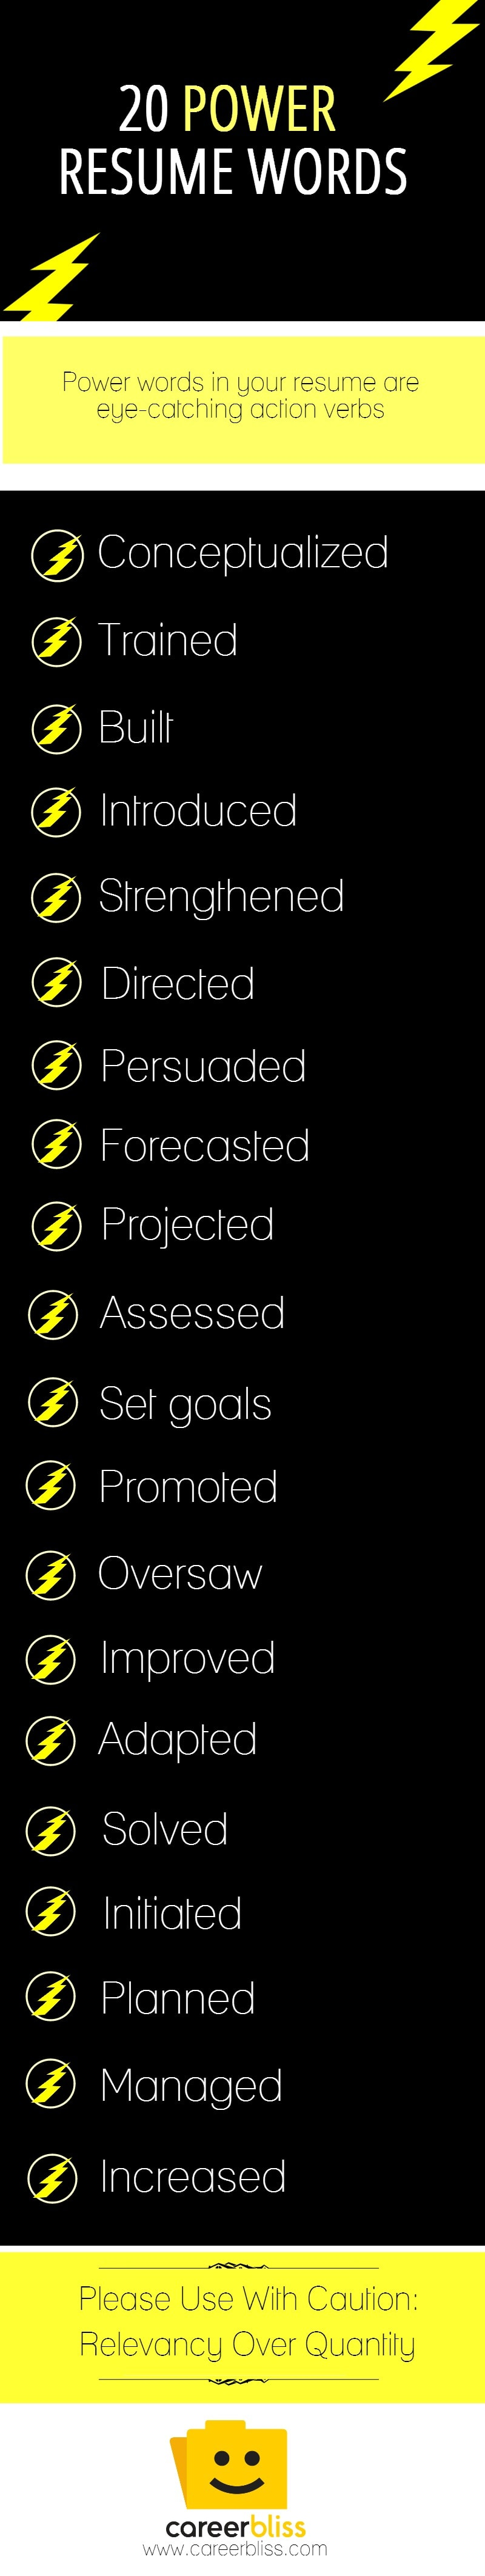 PowerResumeWords